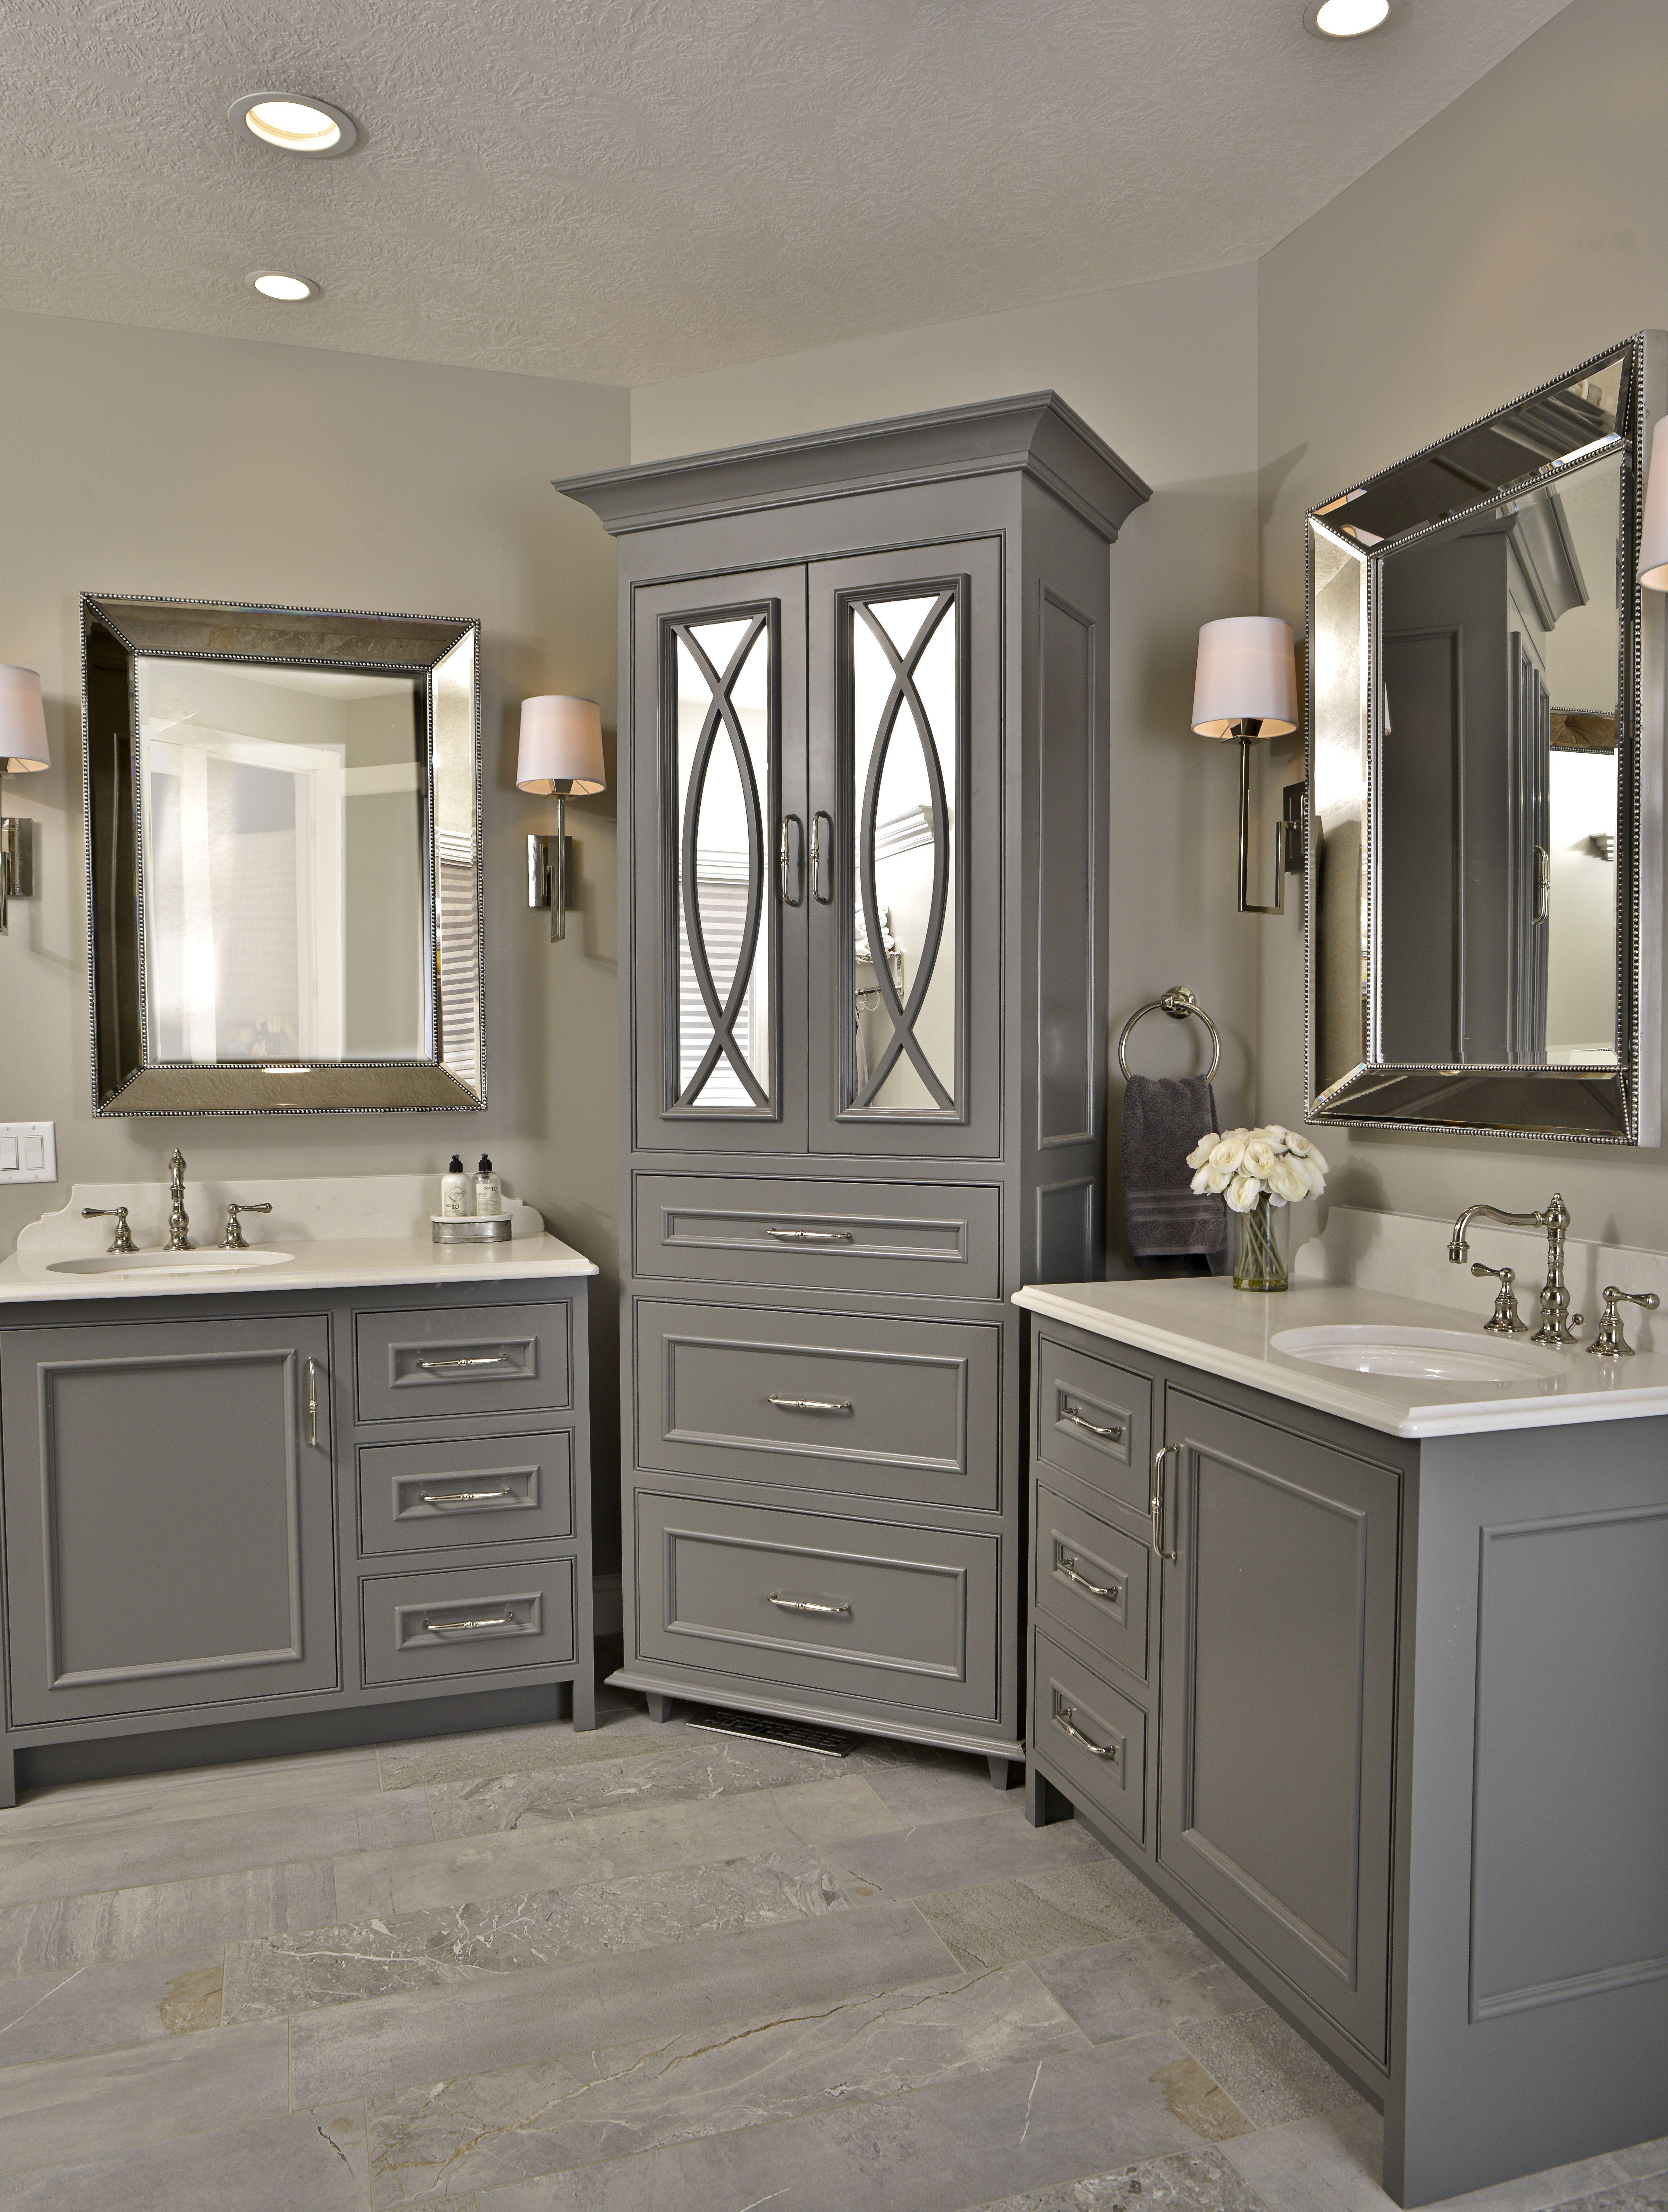 Beautiful Bathroom Gauntlet Gray Cabinets Master Bath Two Vanities Mirrored Bathroom Corner Bathroom Vanity Bathroom Remodel Master Bathroom Corner Cabinet